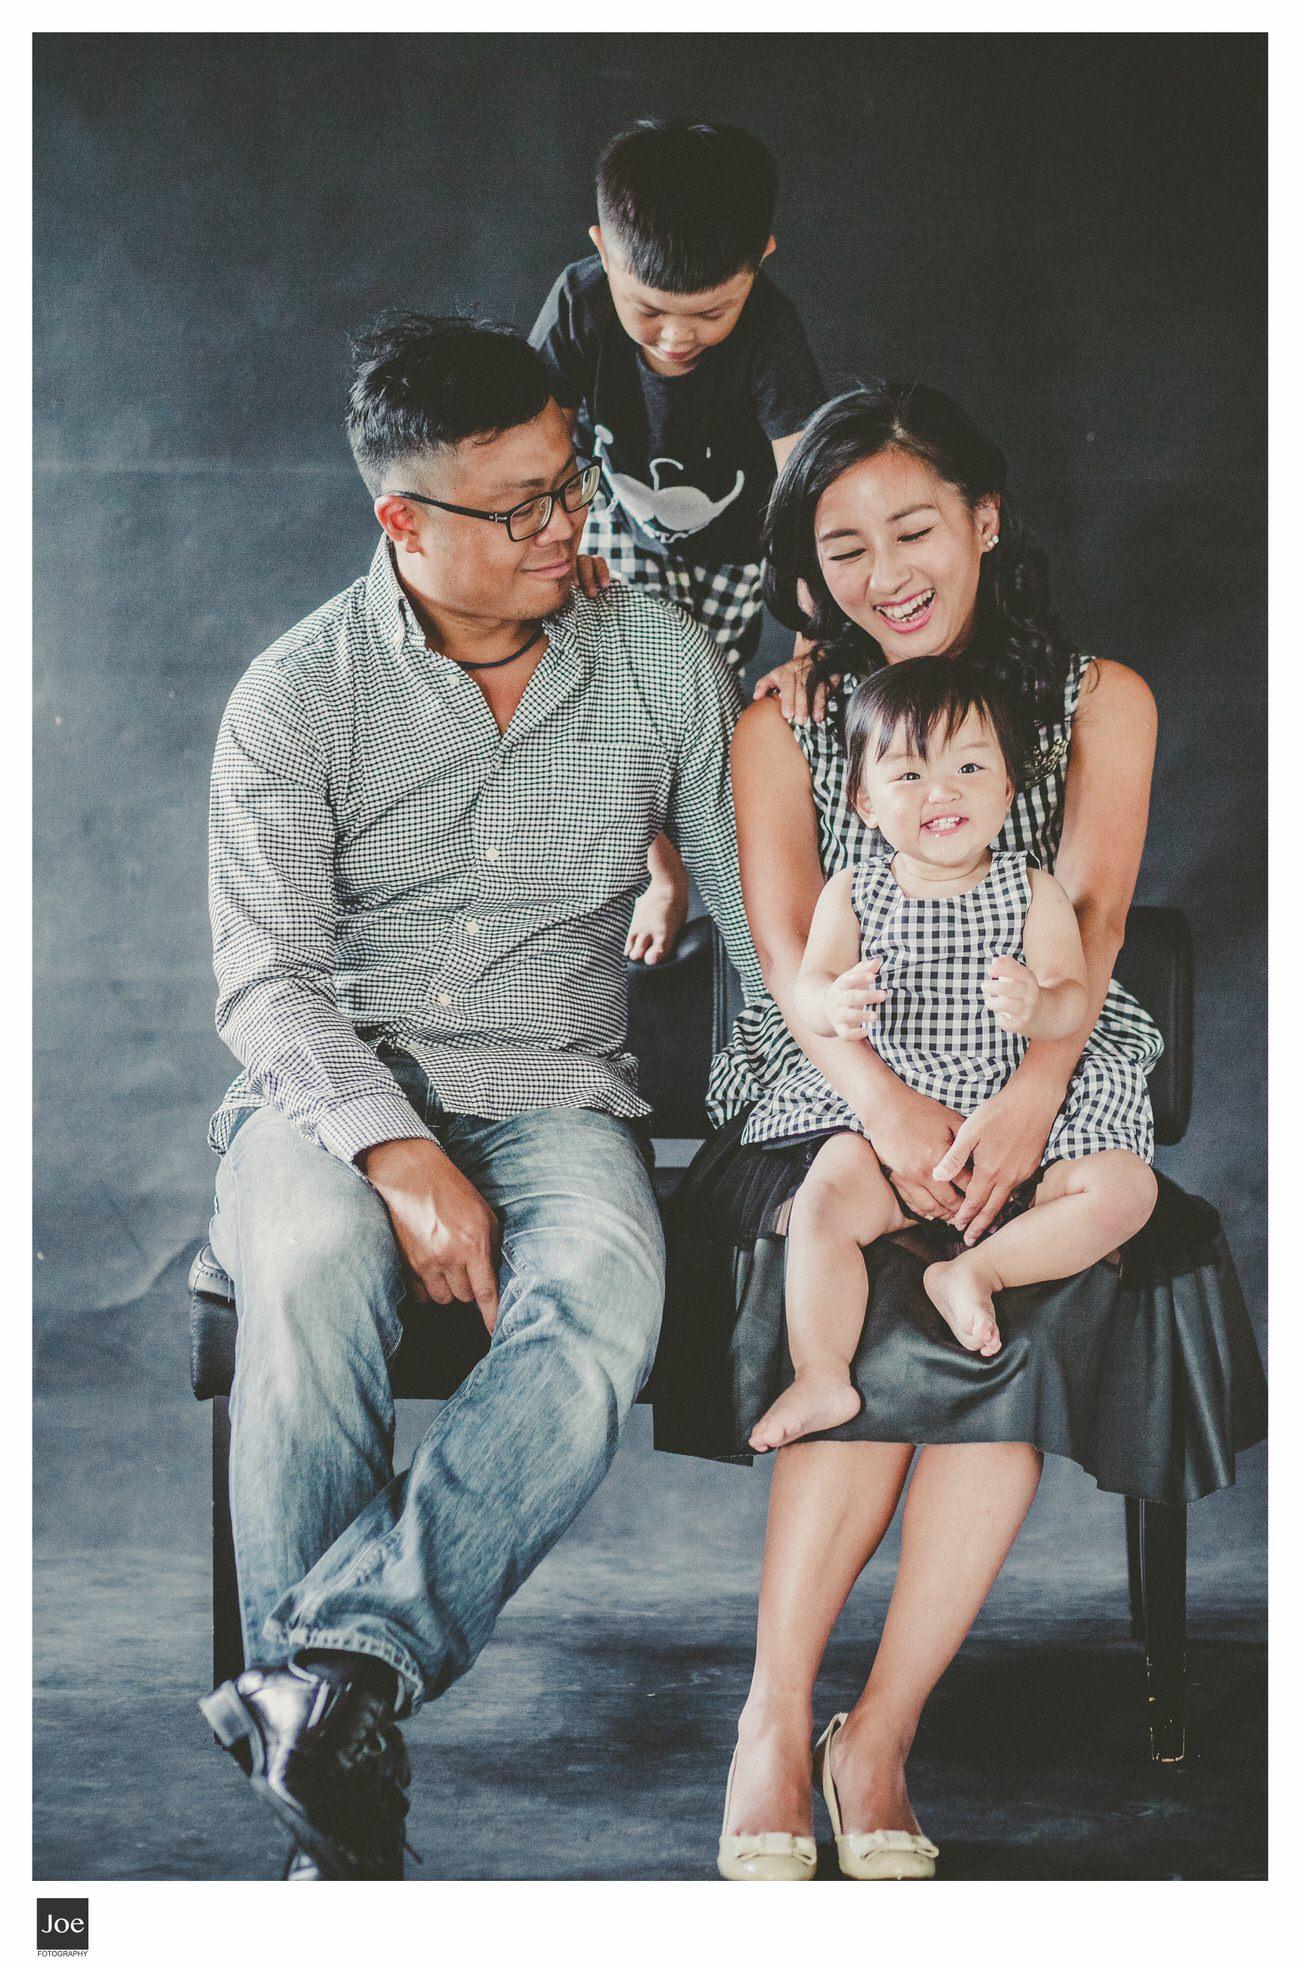 joe-fotography-family-photo-pepper-salt-bowtie-017.jpg